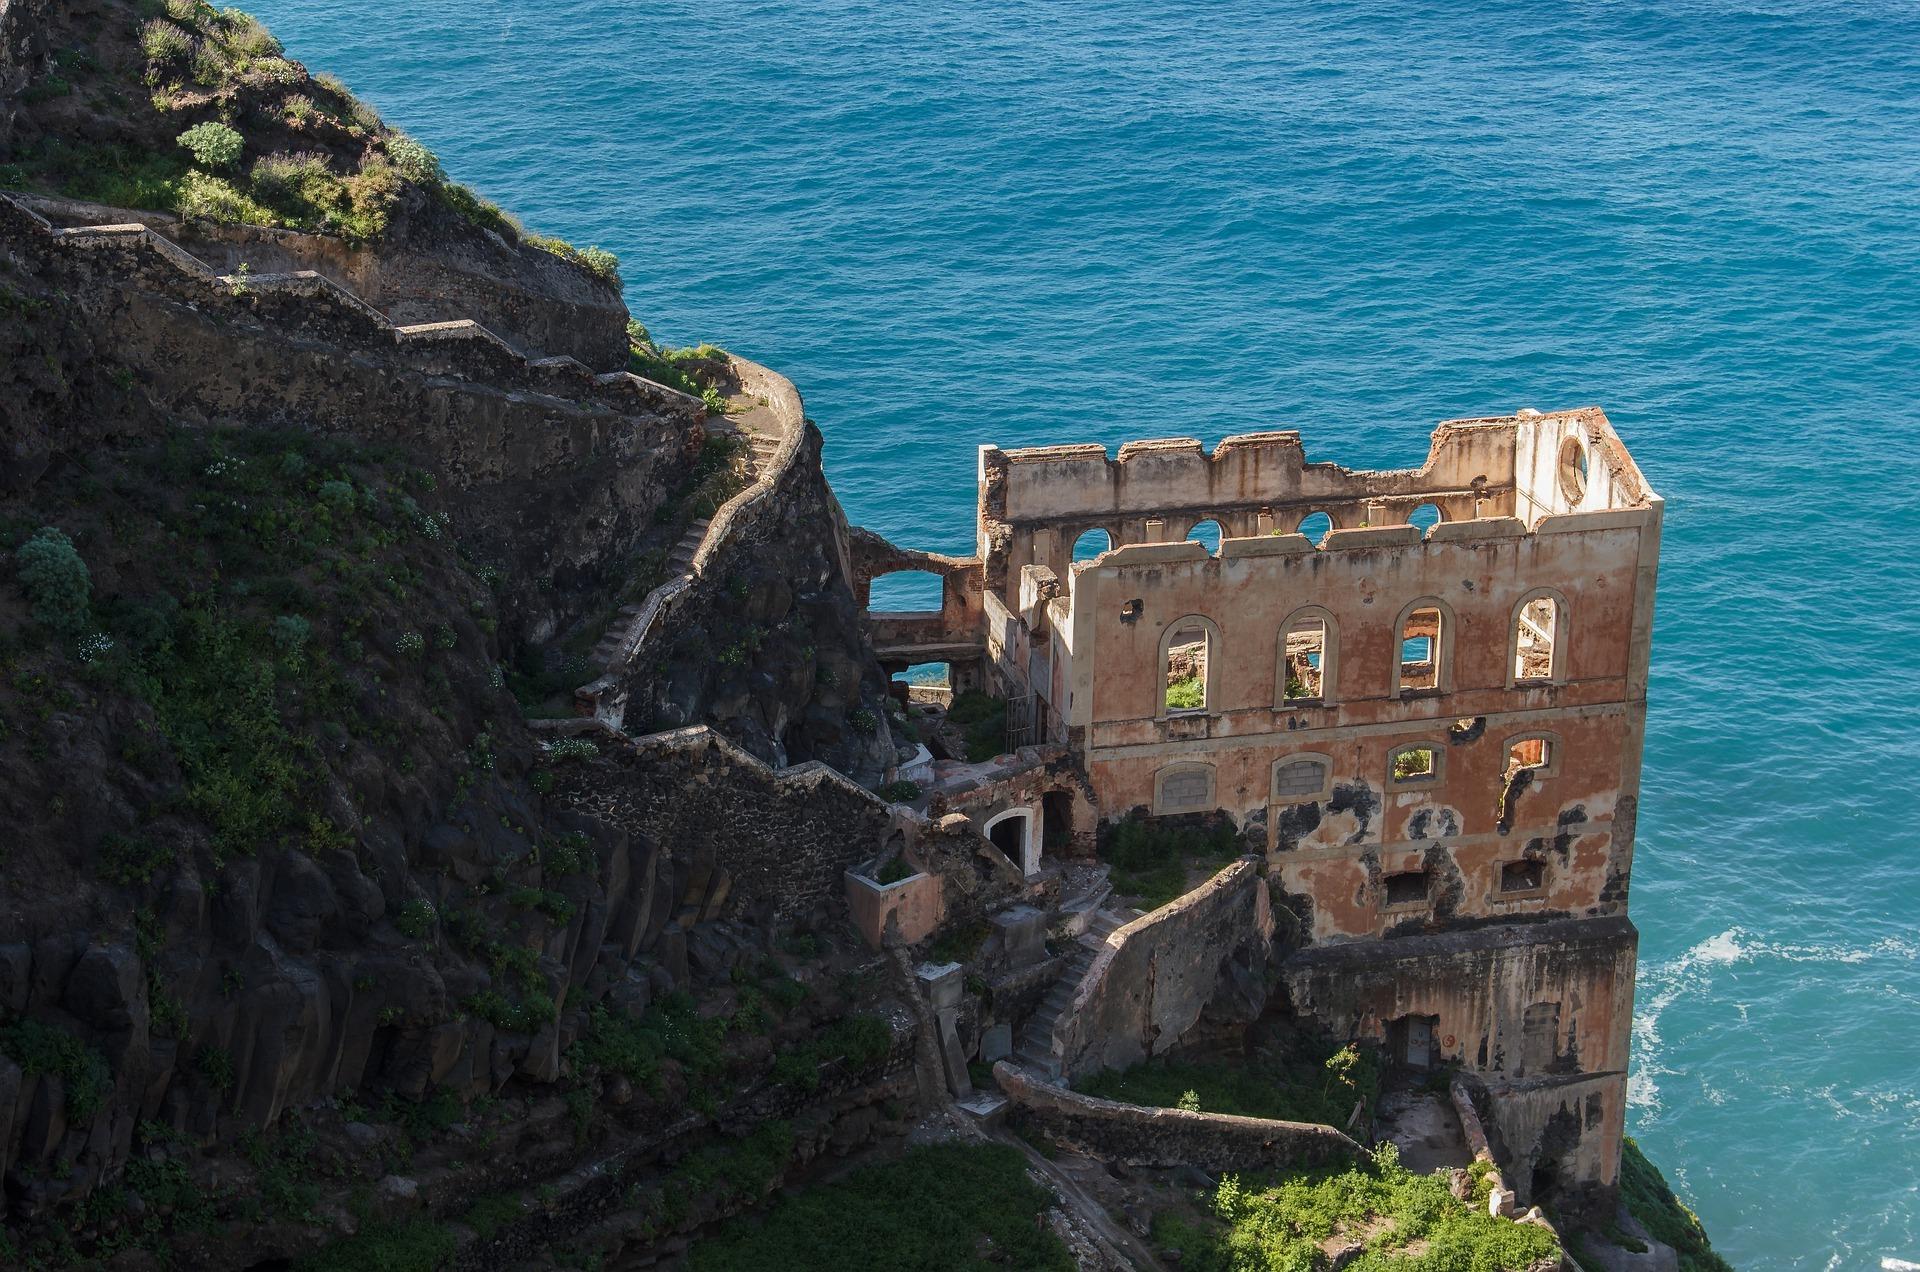 Monastery Ruinen an der Küste von Puerto de la Cruz